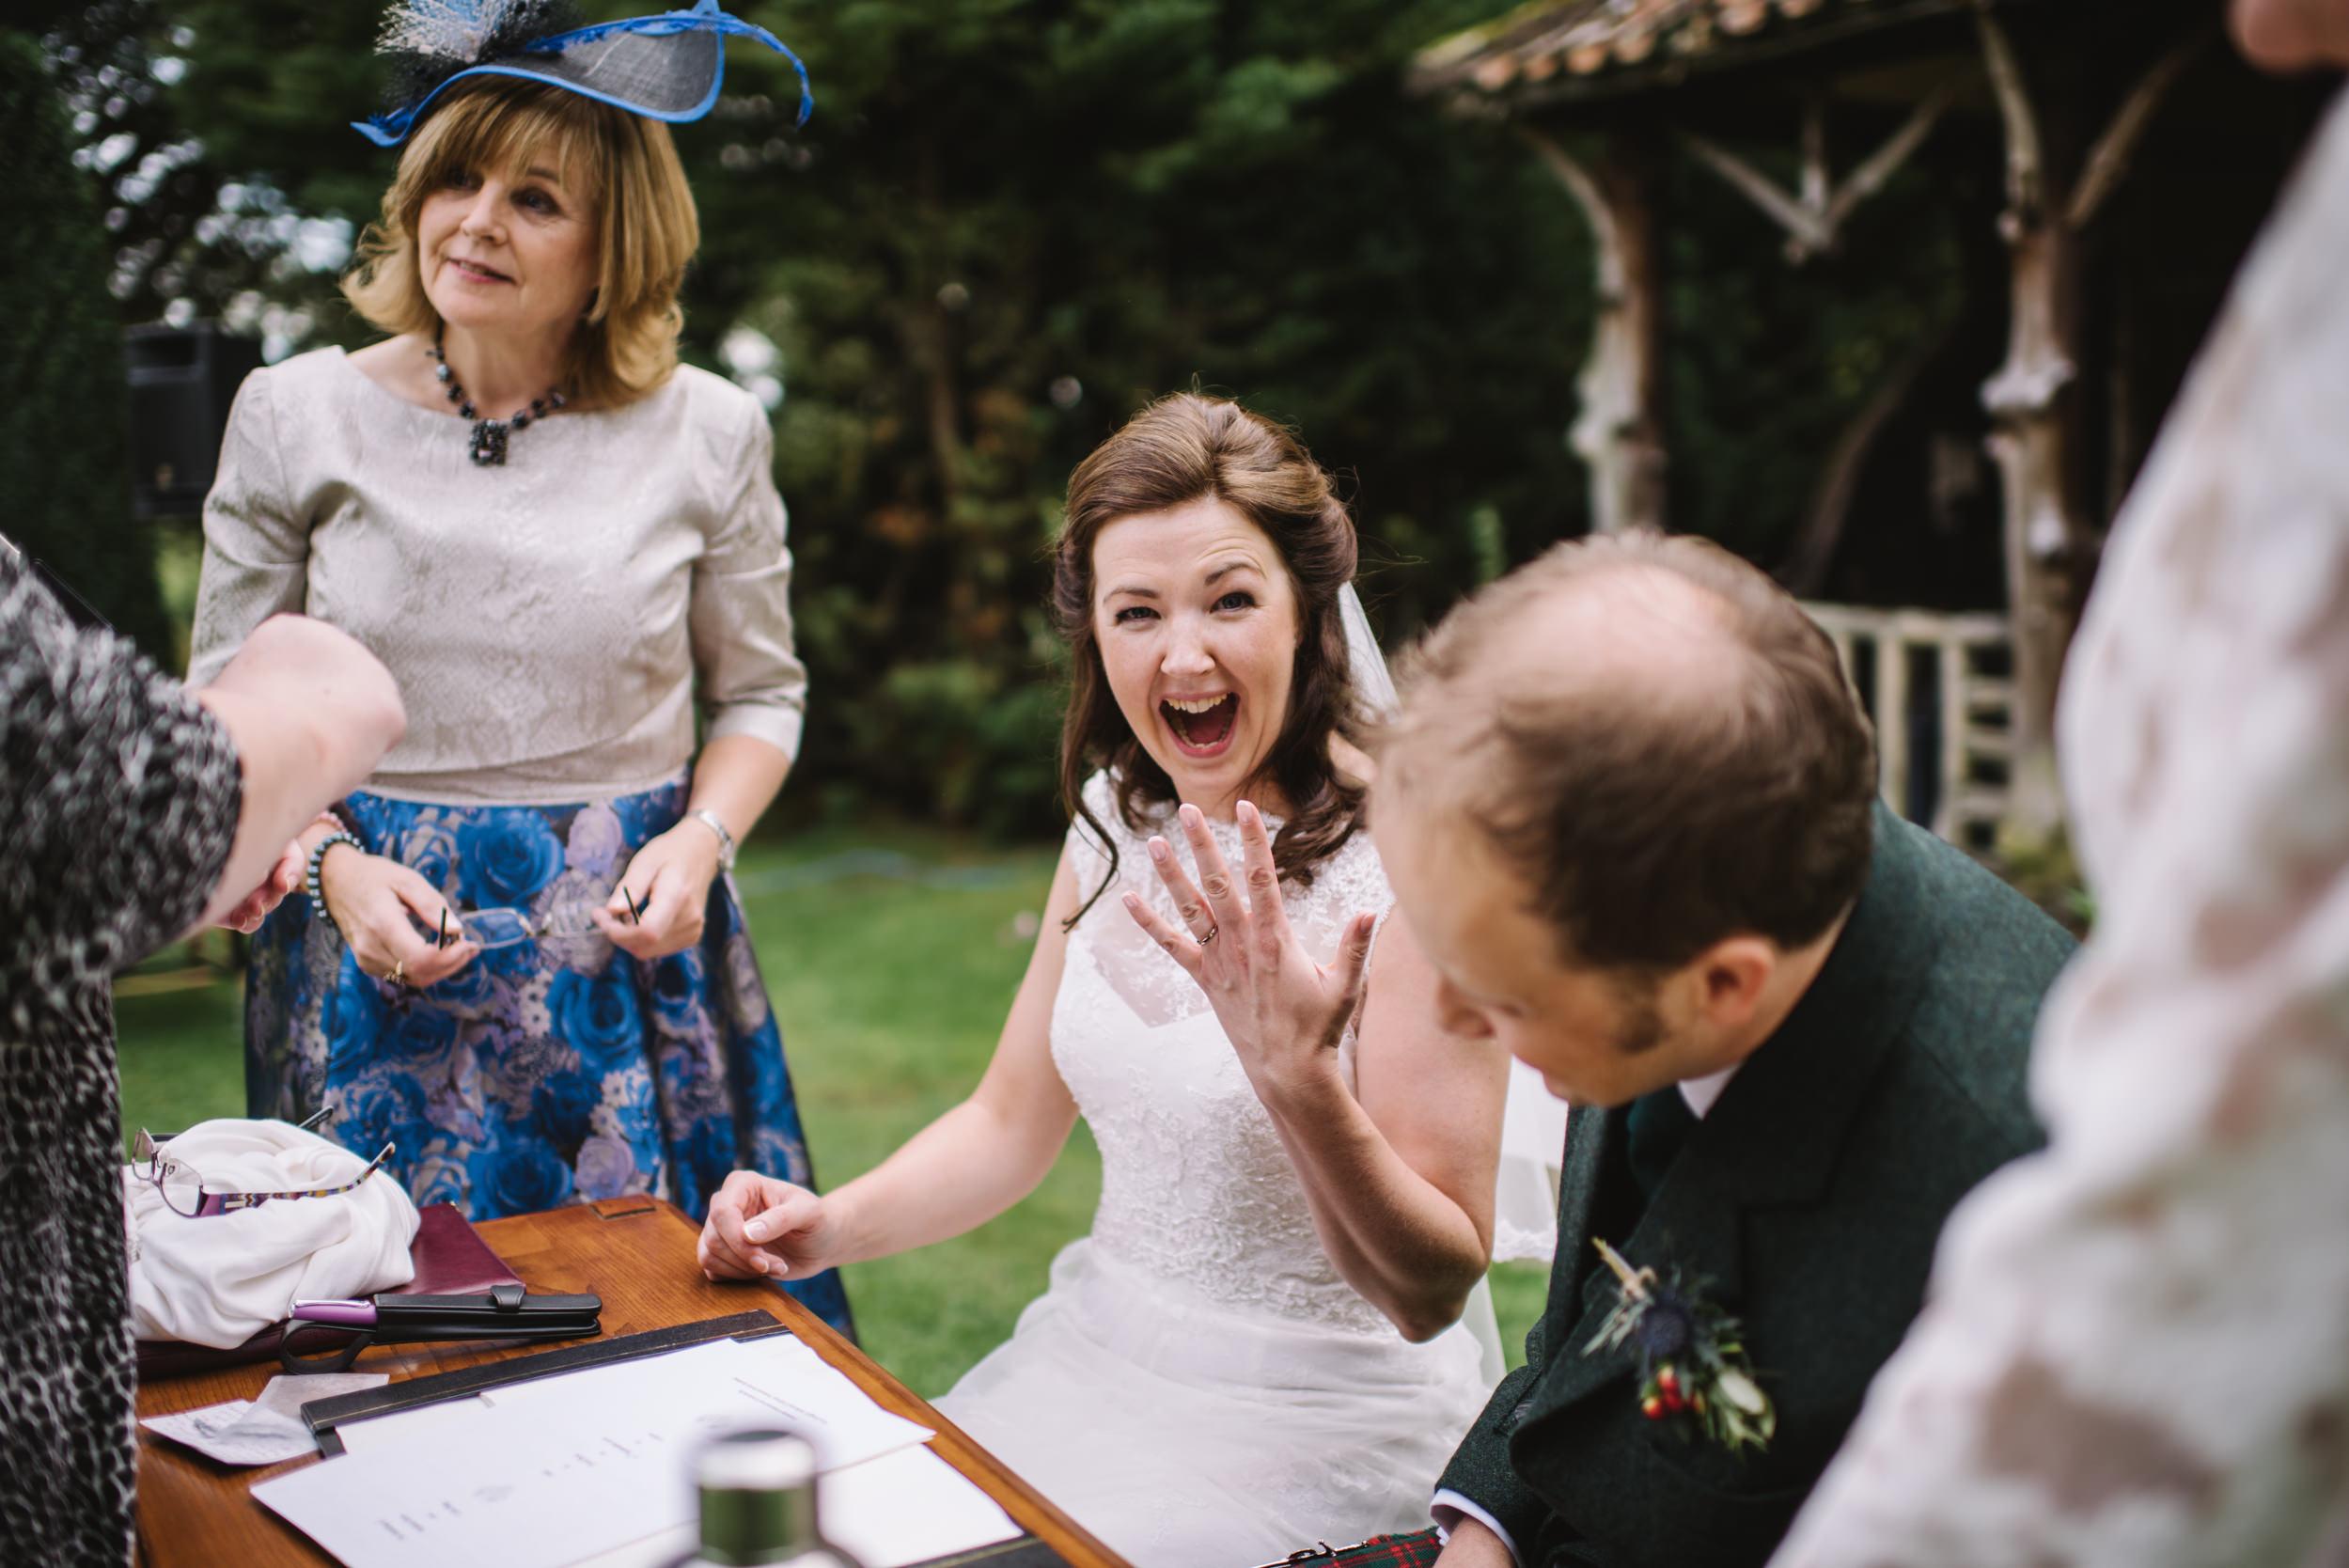 0057-alternative-wedding-portrait-family-kids-photographer-glasgow-scotland.JPG